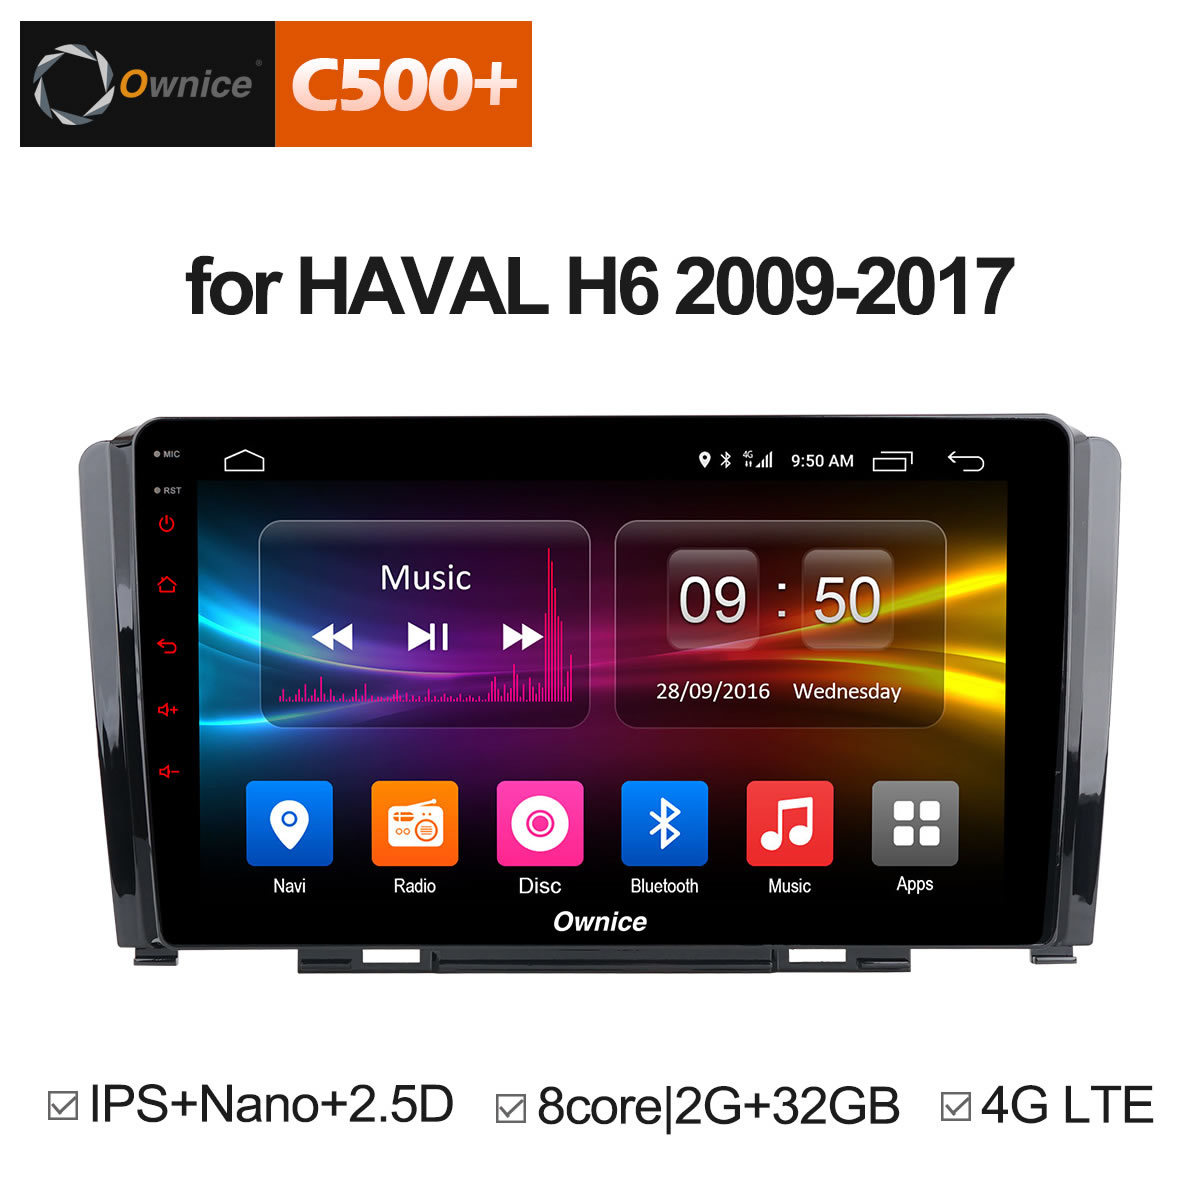 Ownice C500 + G10 Octa Core lecteur DVD de voiture Android 8.1 pour grande muraille Hover Haval H6 2G RAM + 32G Flash Radio GPS Navigation 4G LTE